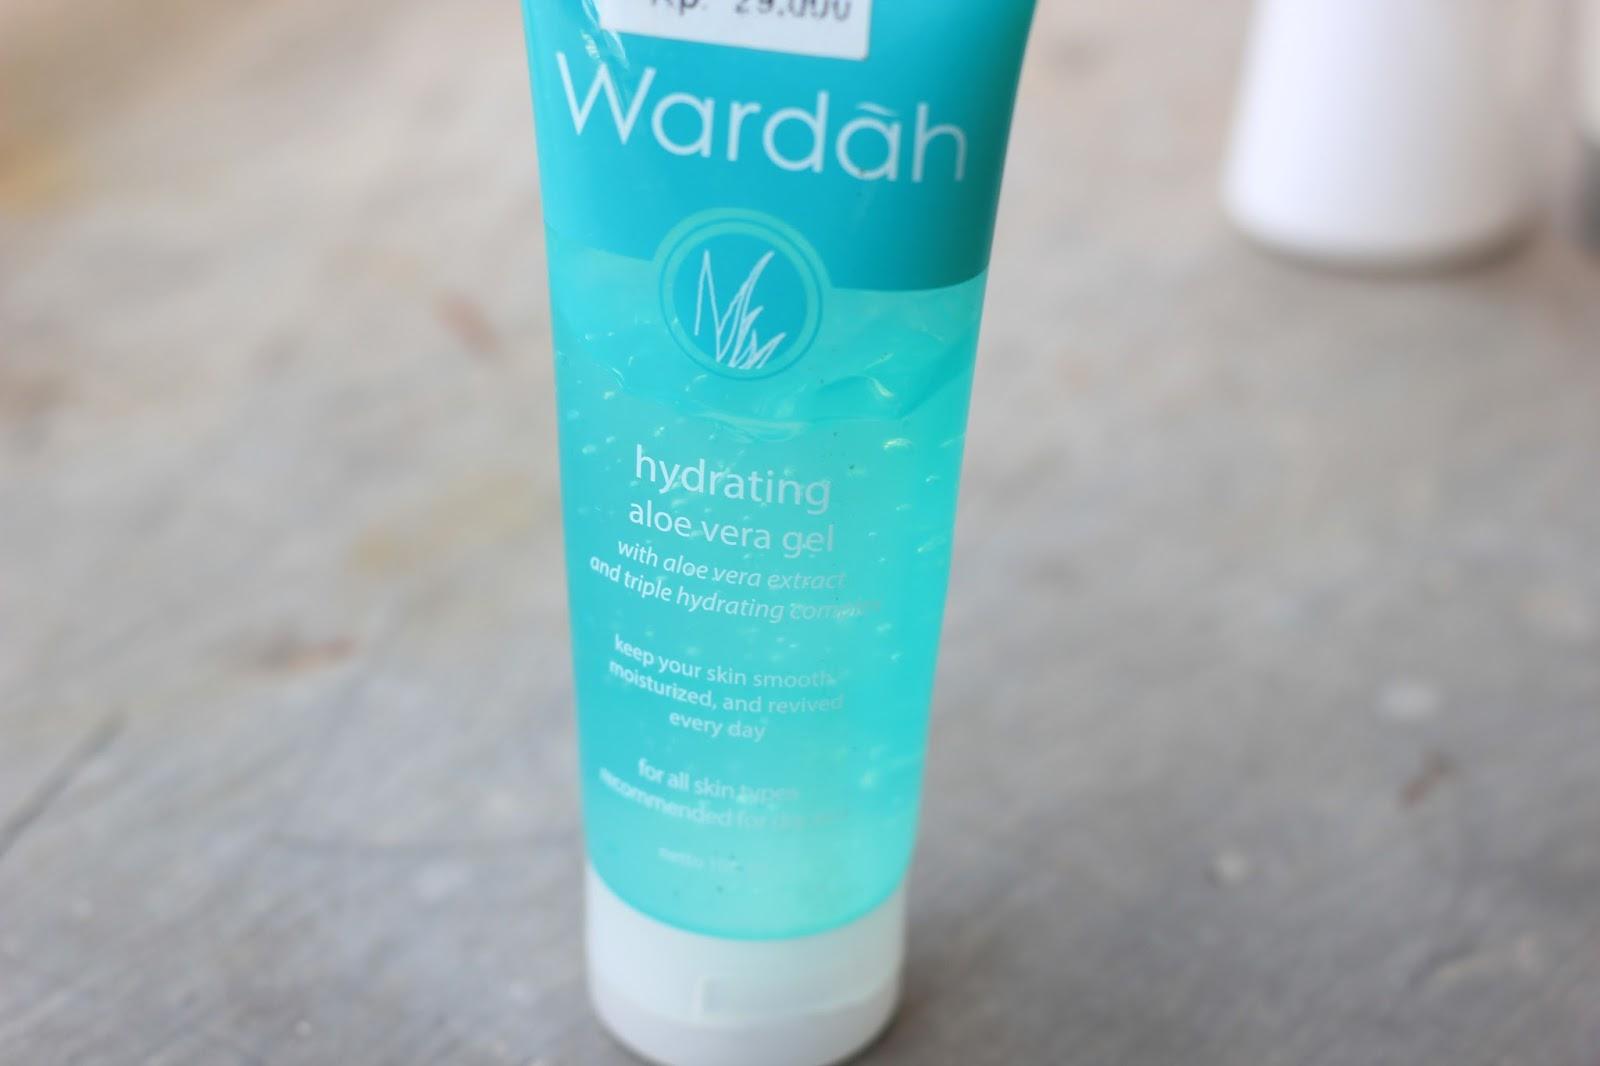 Review: Wardah Hydrating Aloe Vera Gel - bungabangun